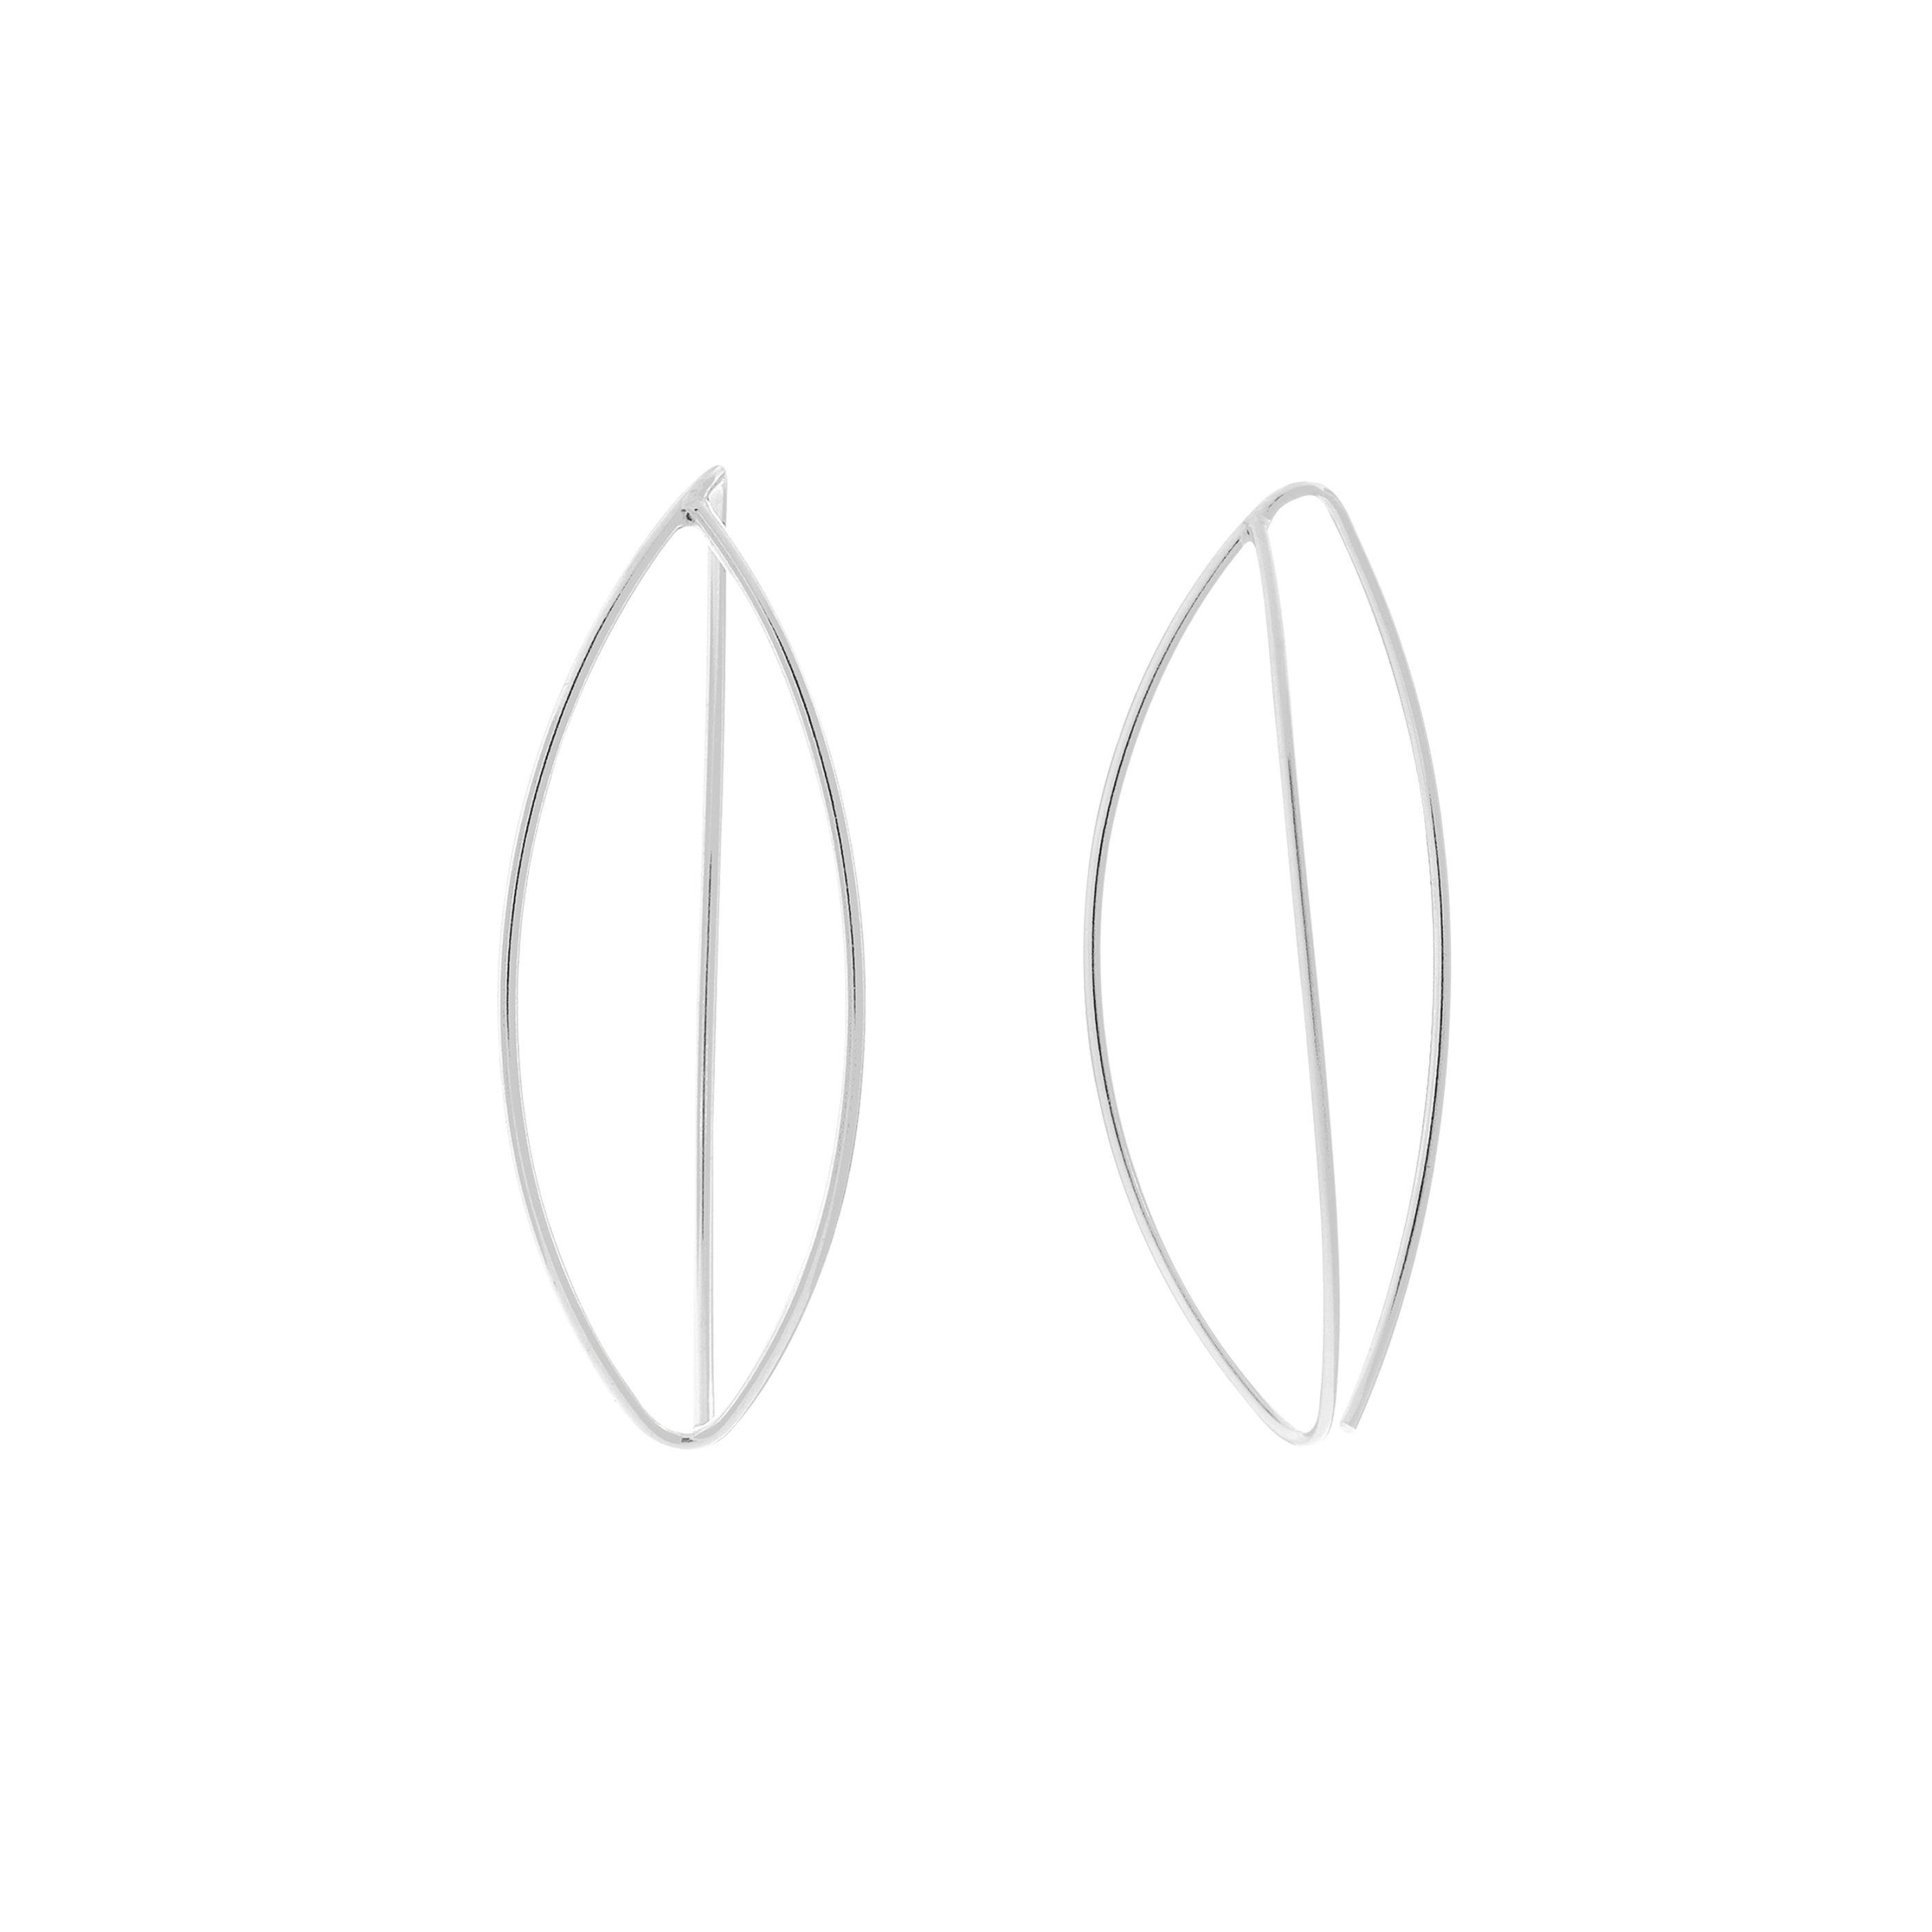 Together big earrings